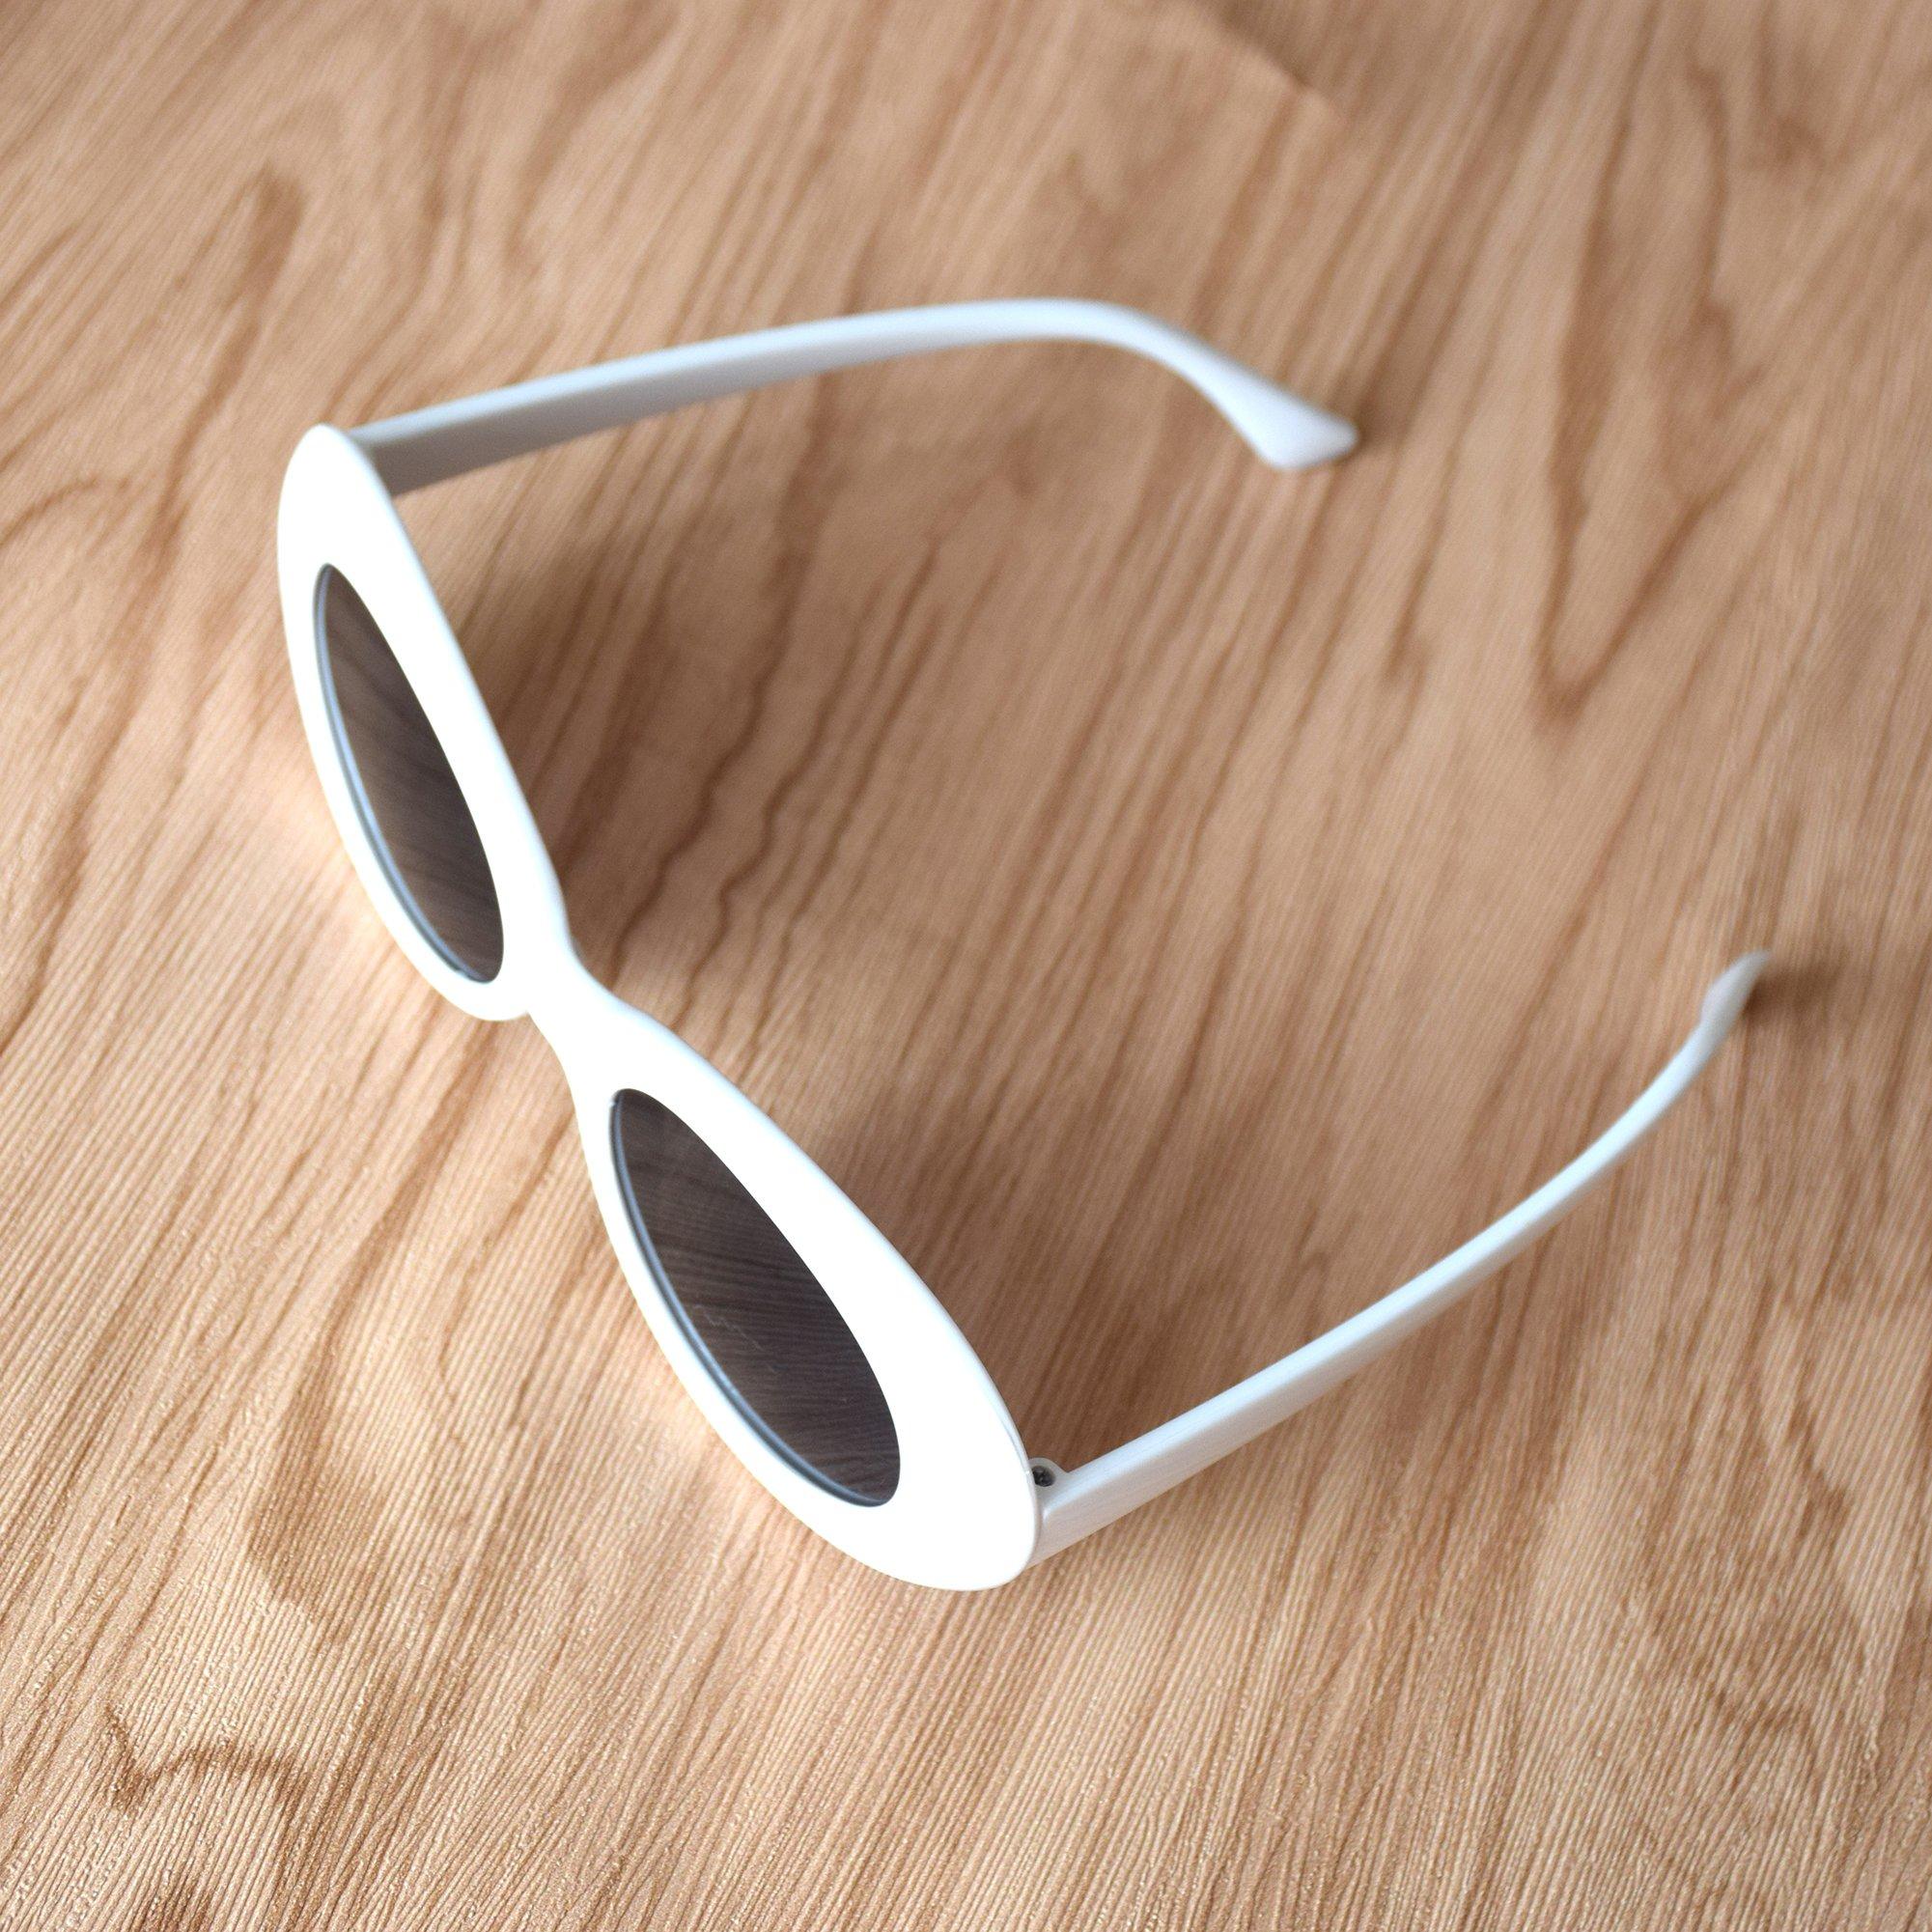 51e642d448 JUSLINK Bold Retro Oval Mod Thick Frame Sunglasses Round Lens Clout Goggles  White - USJL00071   Sunglasses   Clothing